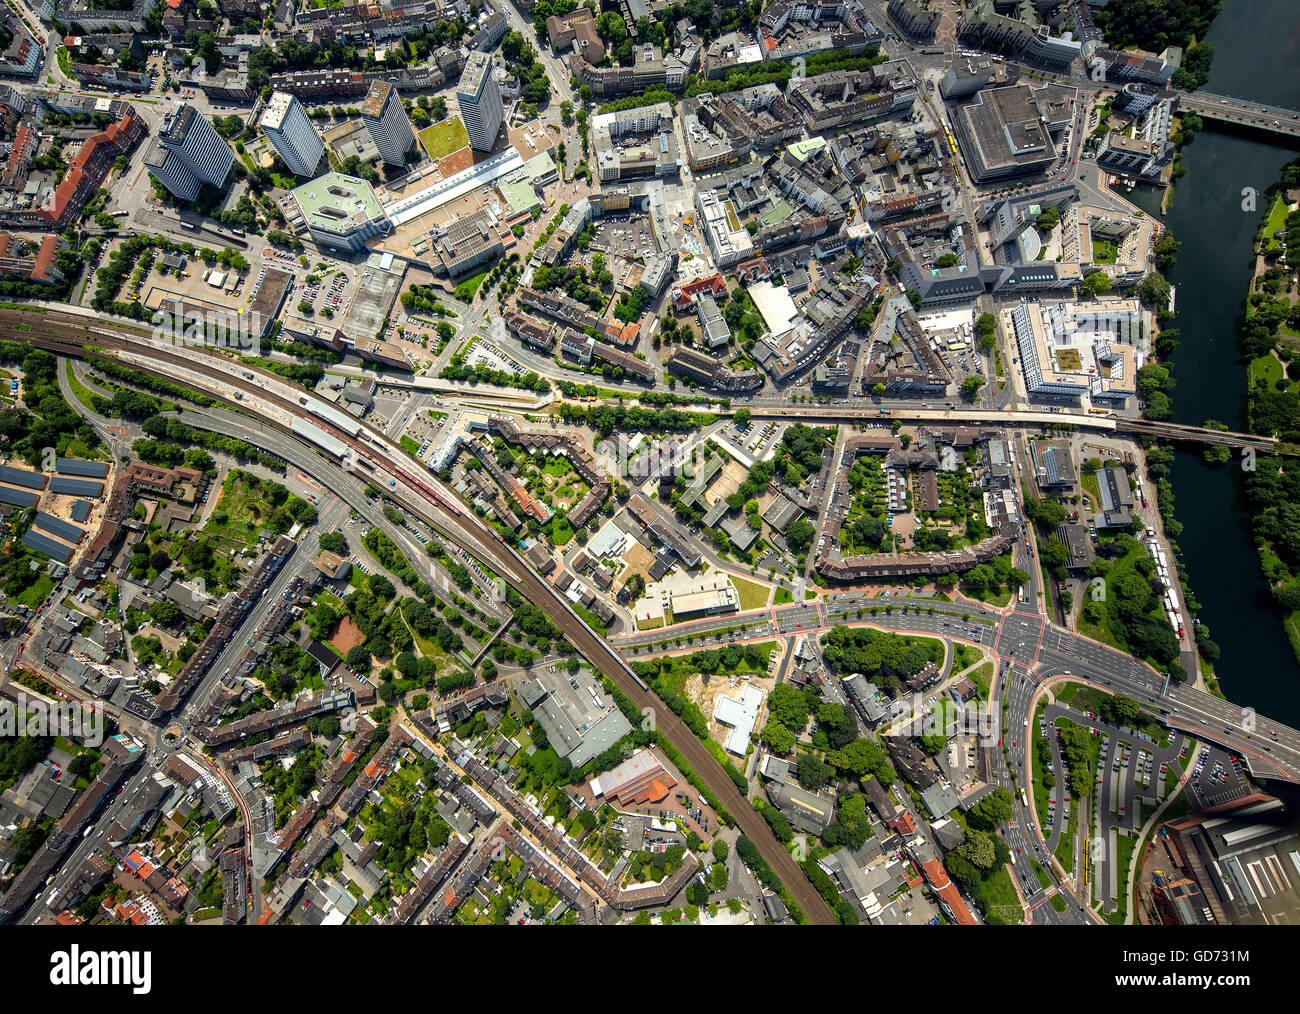 Aerial view, vertical photographs of Mülheim City, downtown with Ruhrbania, Mülheim an der Ruhr, Ruhr - Stock Image